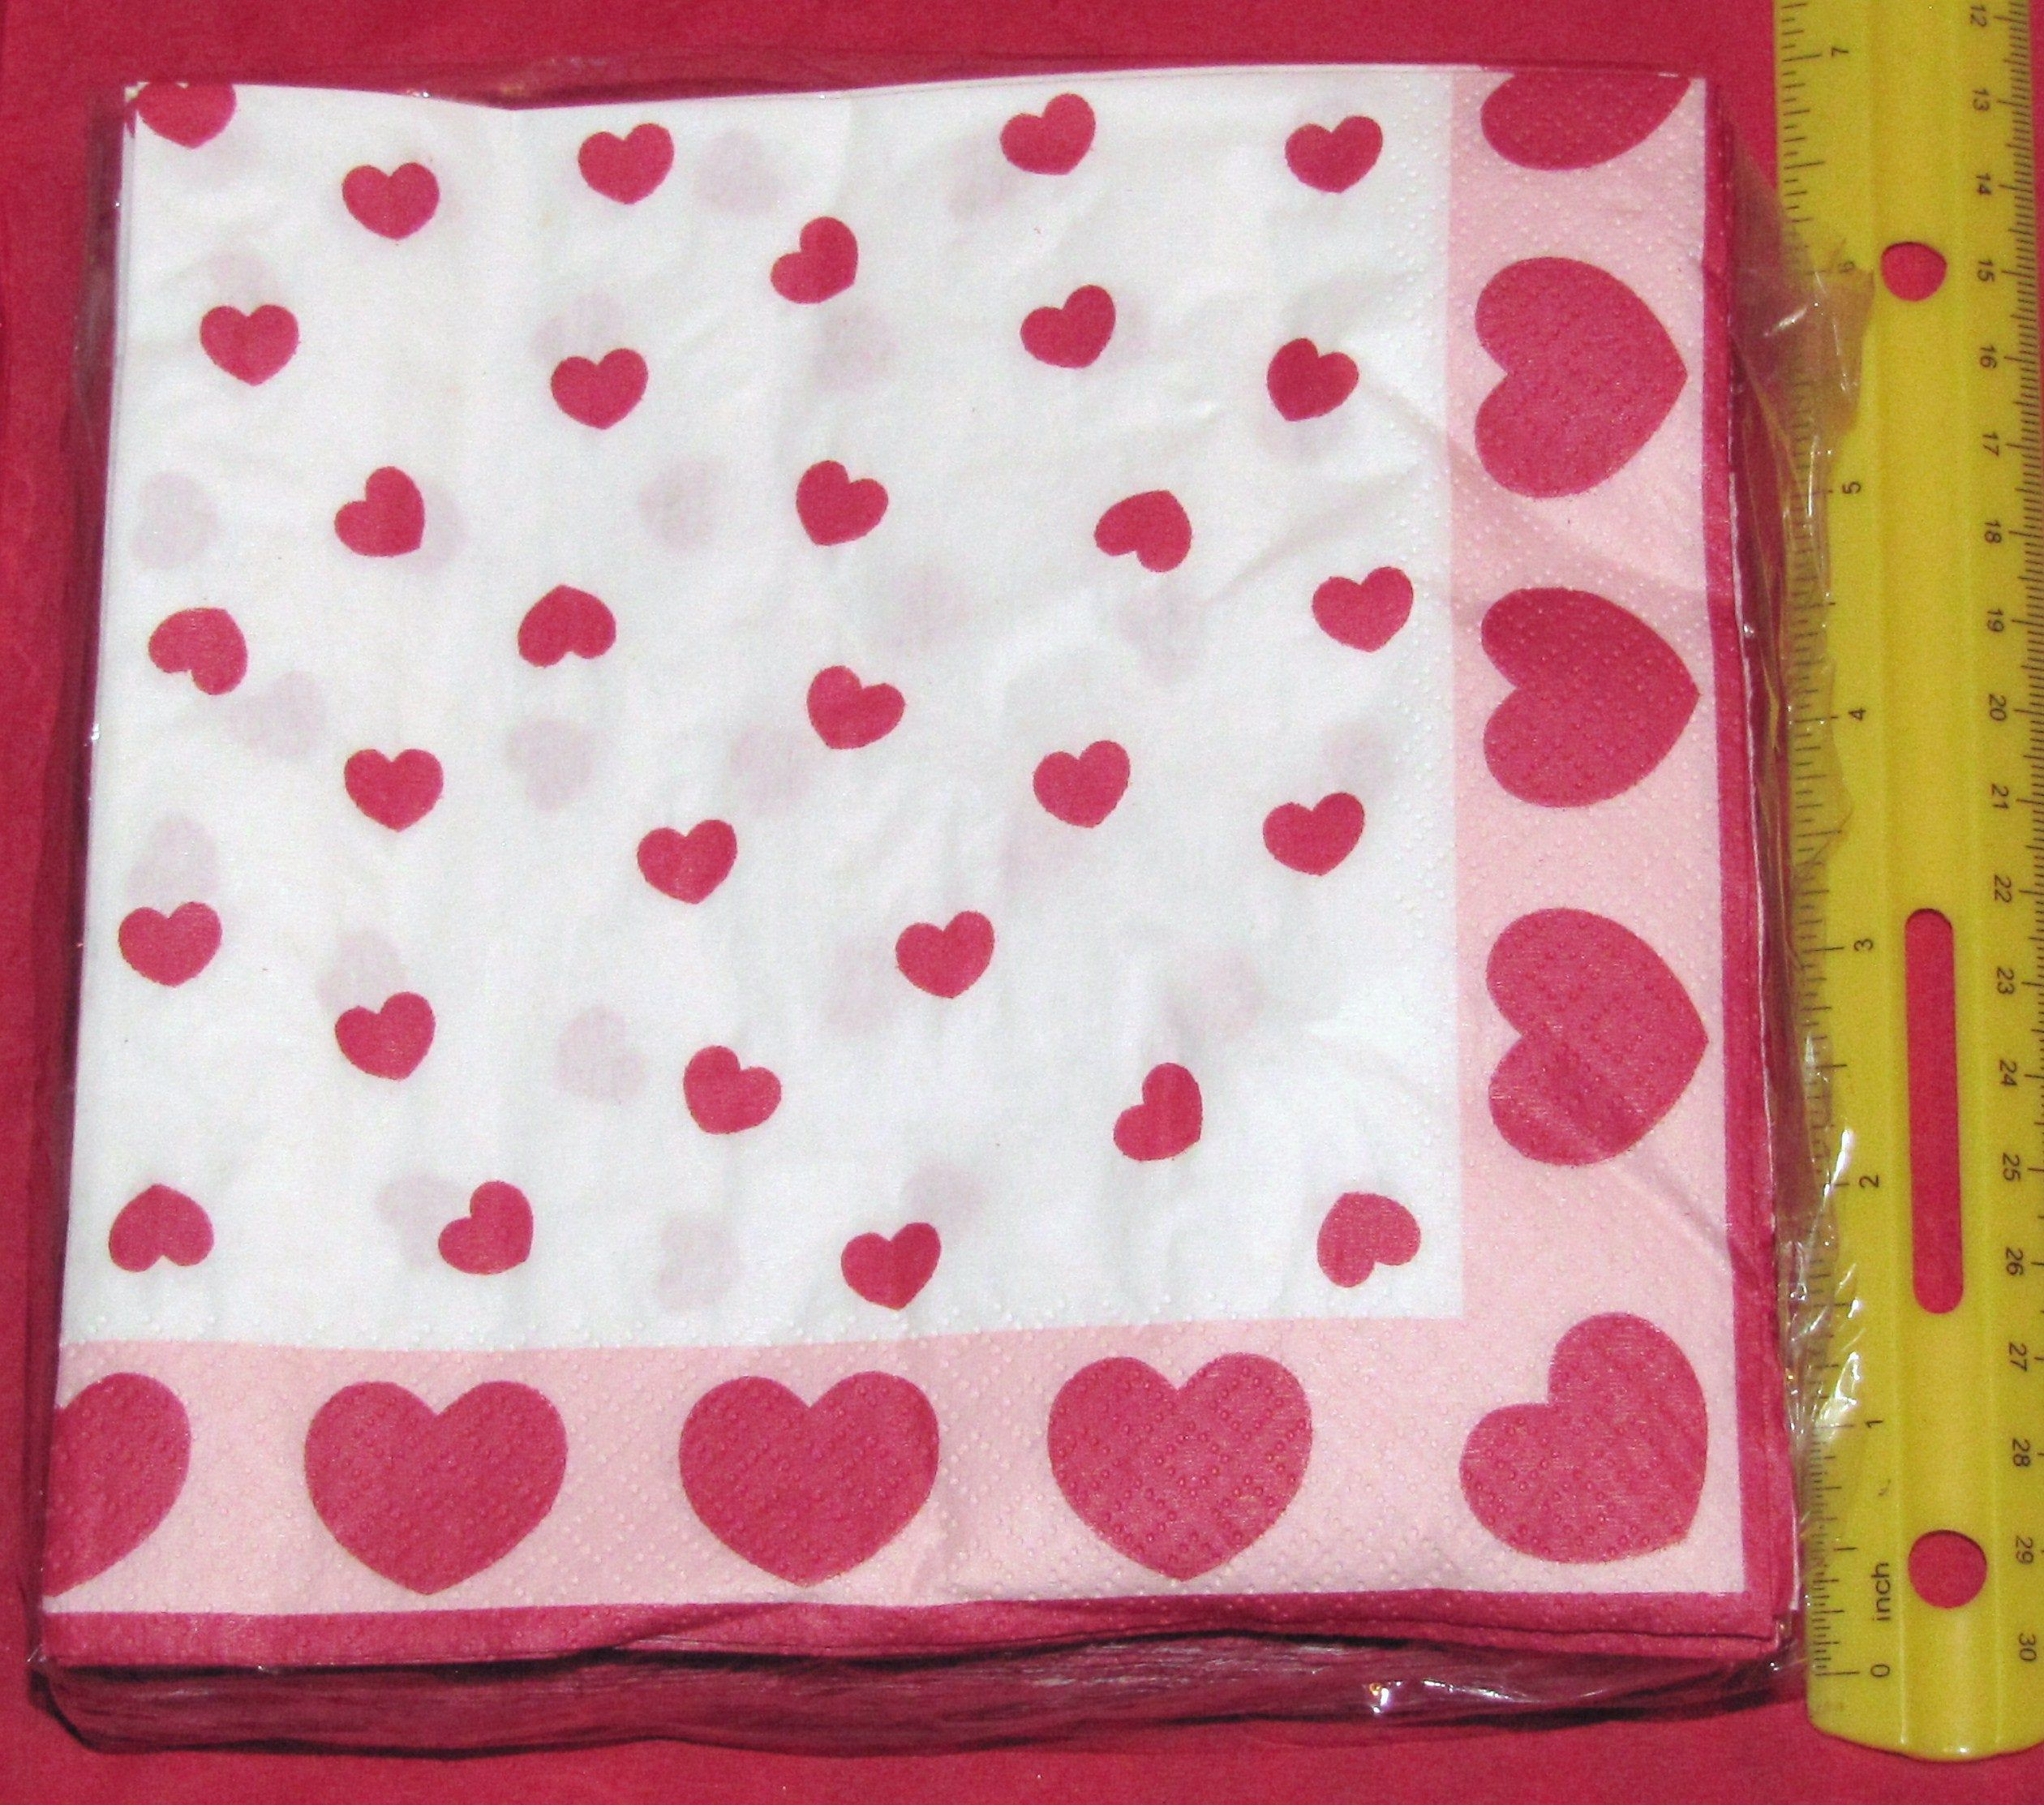 Sweethearts Luncheon Napkins 50/pk #21234, Heart Napkins, Valentine Paper Napkins #papernapkins